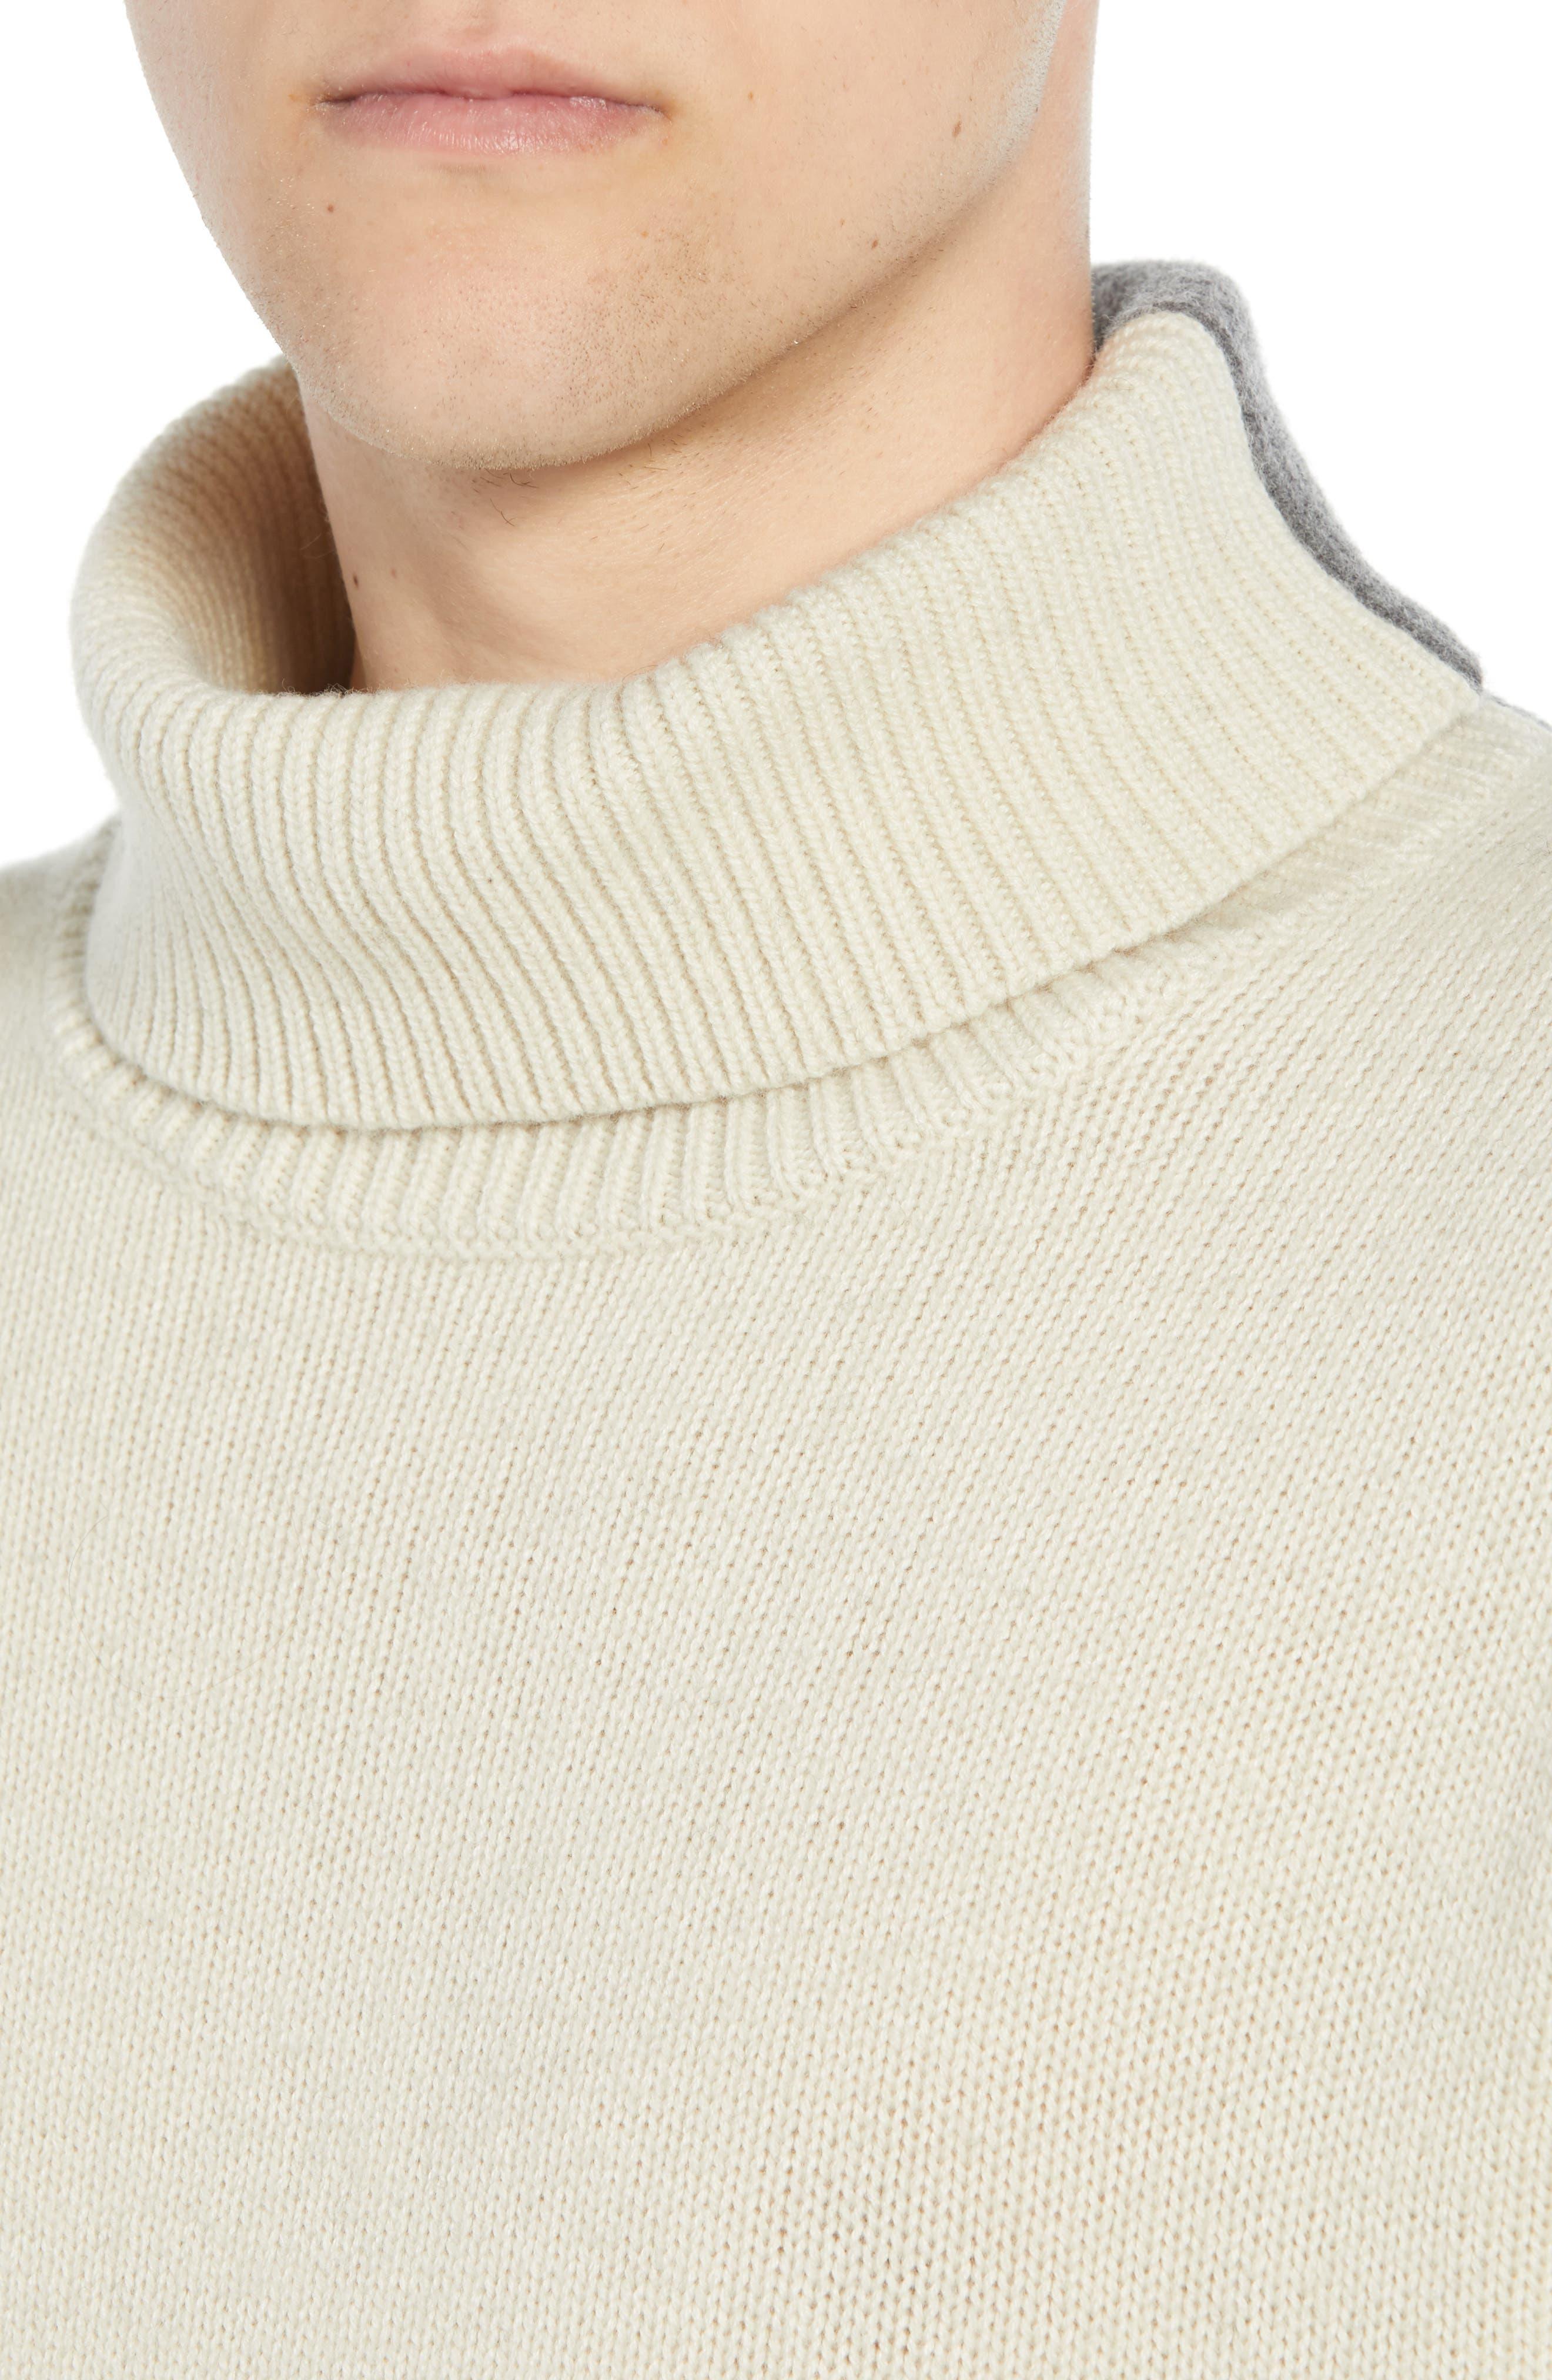 Colorblock Turtleneck Sweater,                             Alternate thumbnail 4, color,                             FOG MID GREY MELANGE